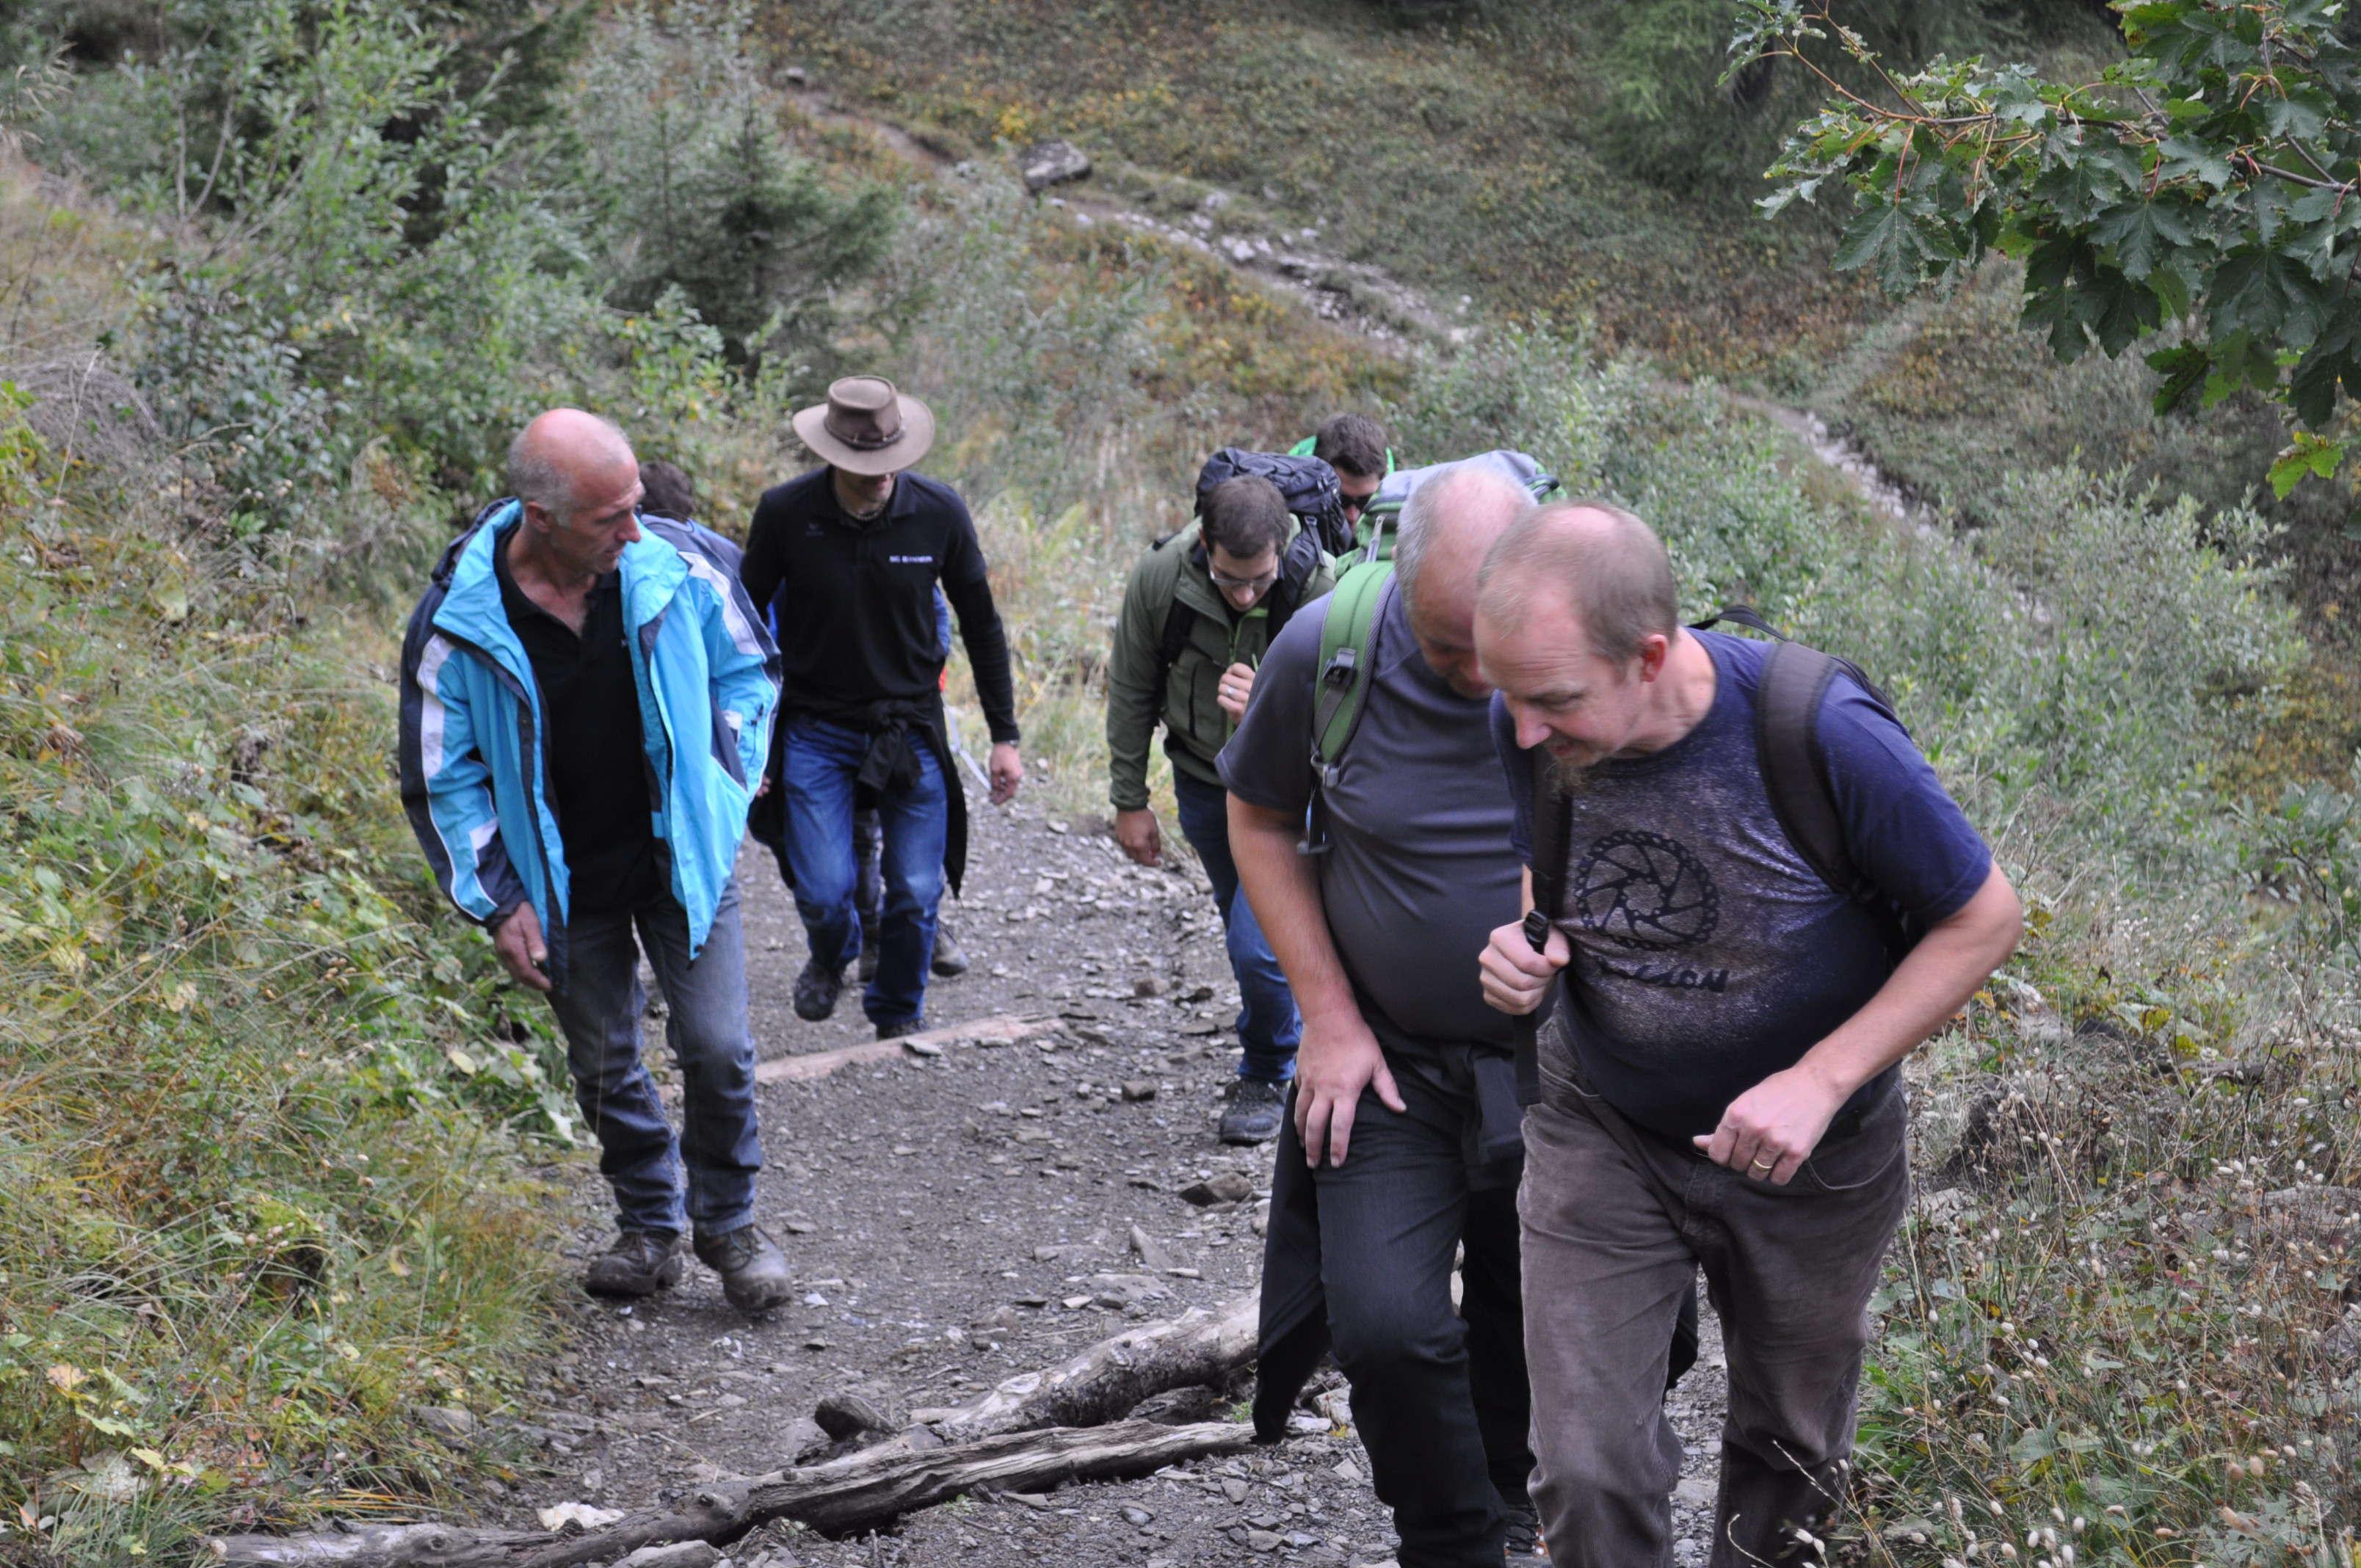 Klettersteig Engstligenalp : Fotogalerie musikreise engstligenalp musikgesellschaft